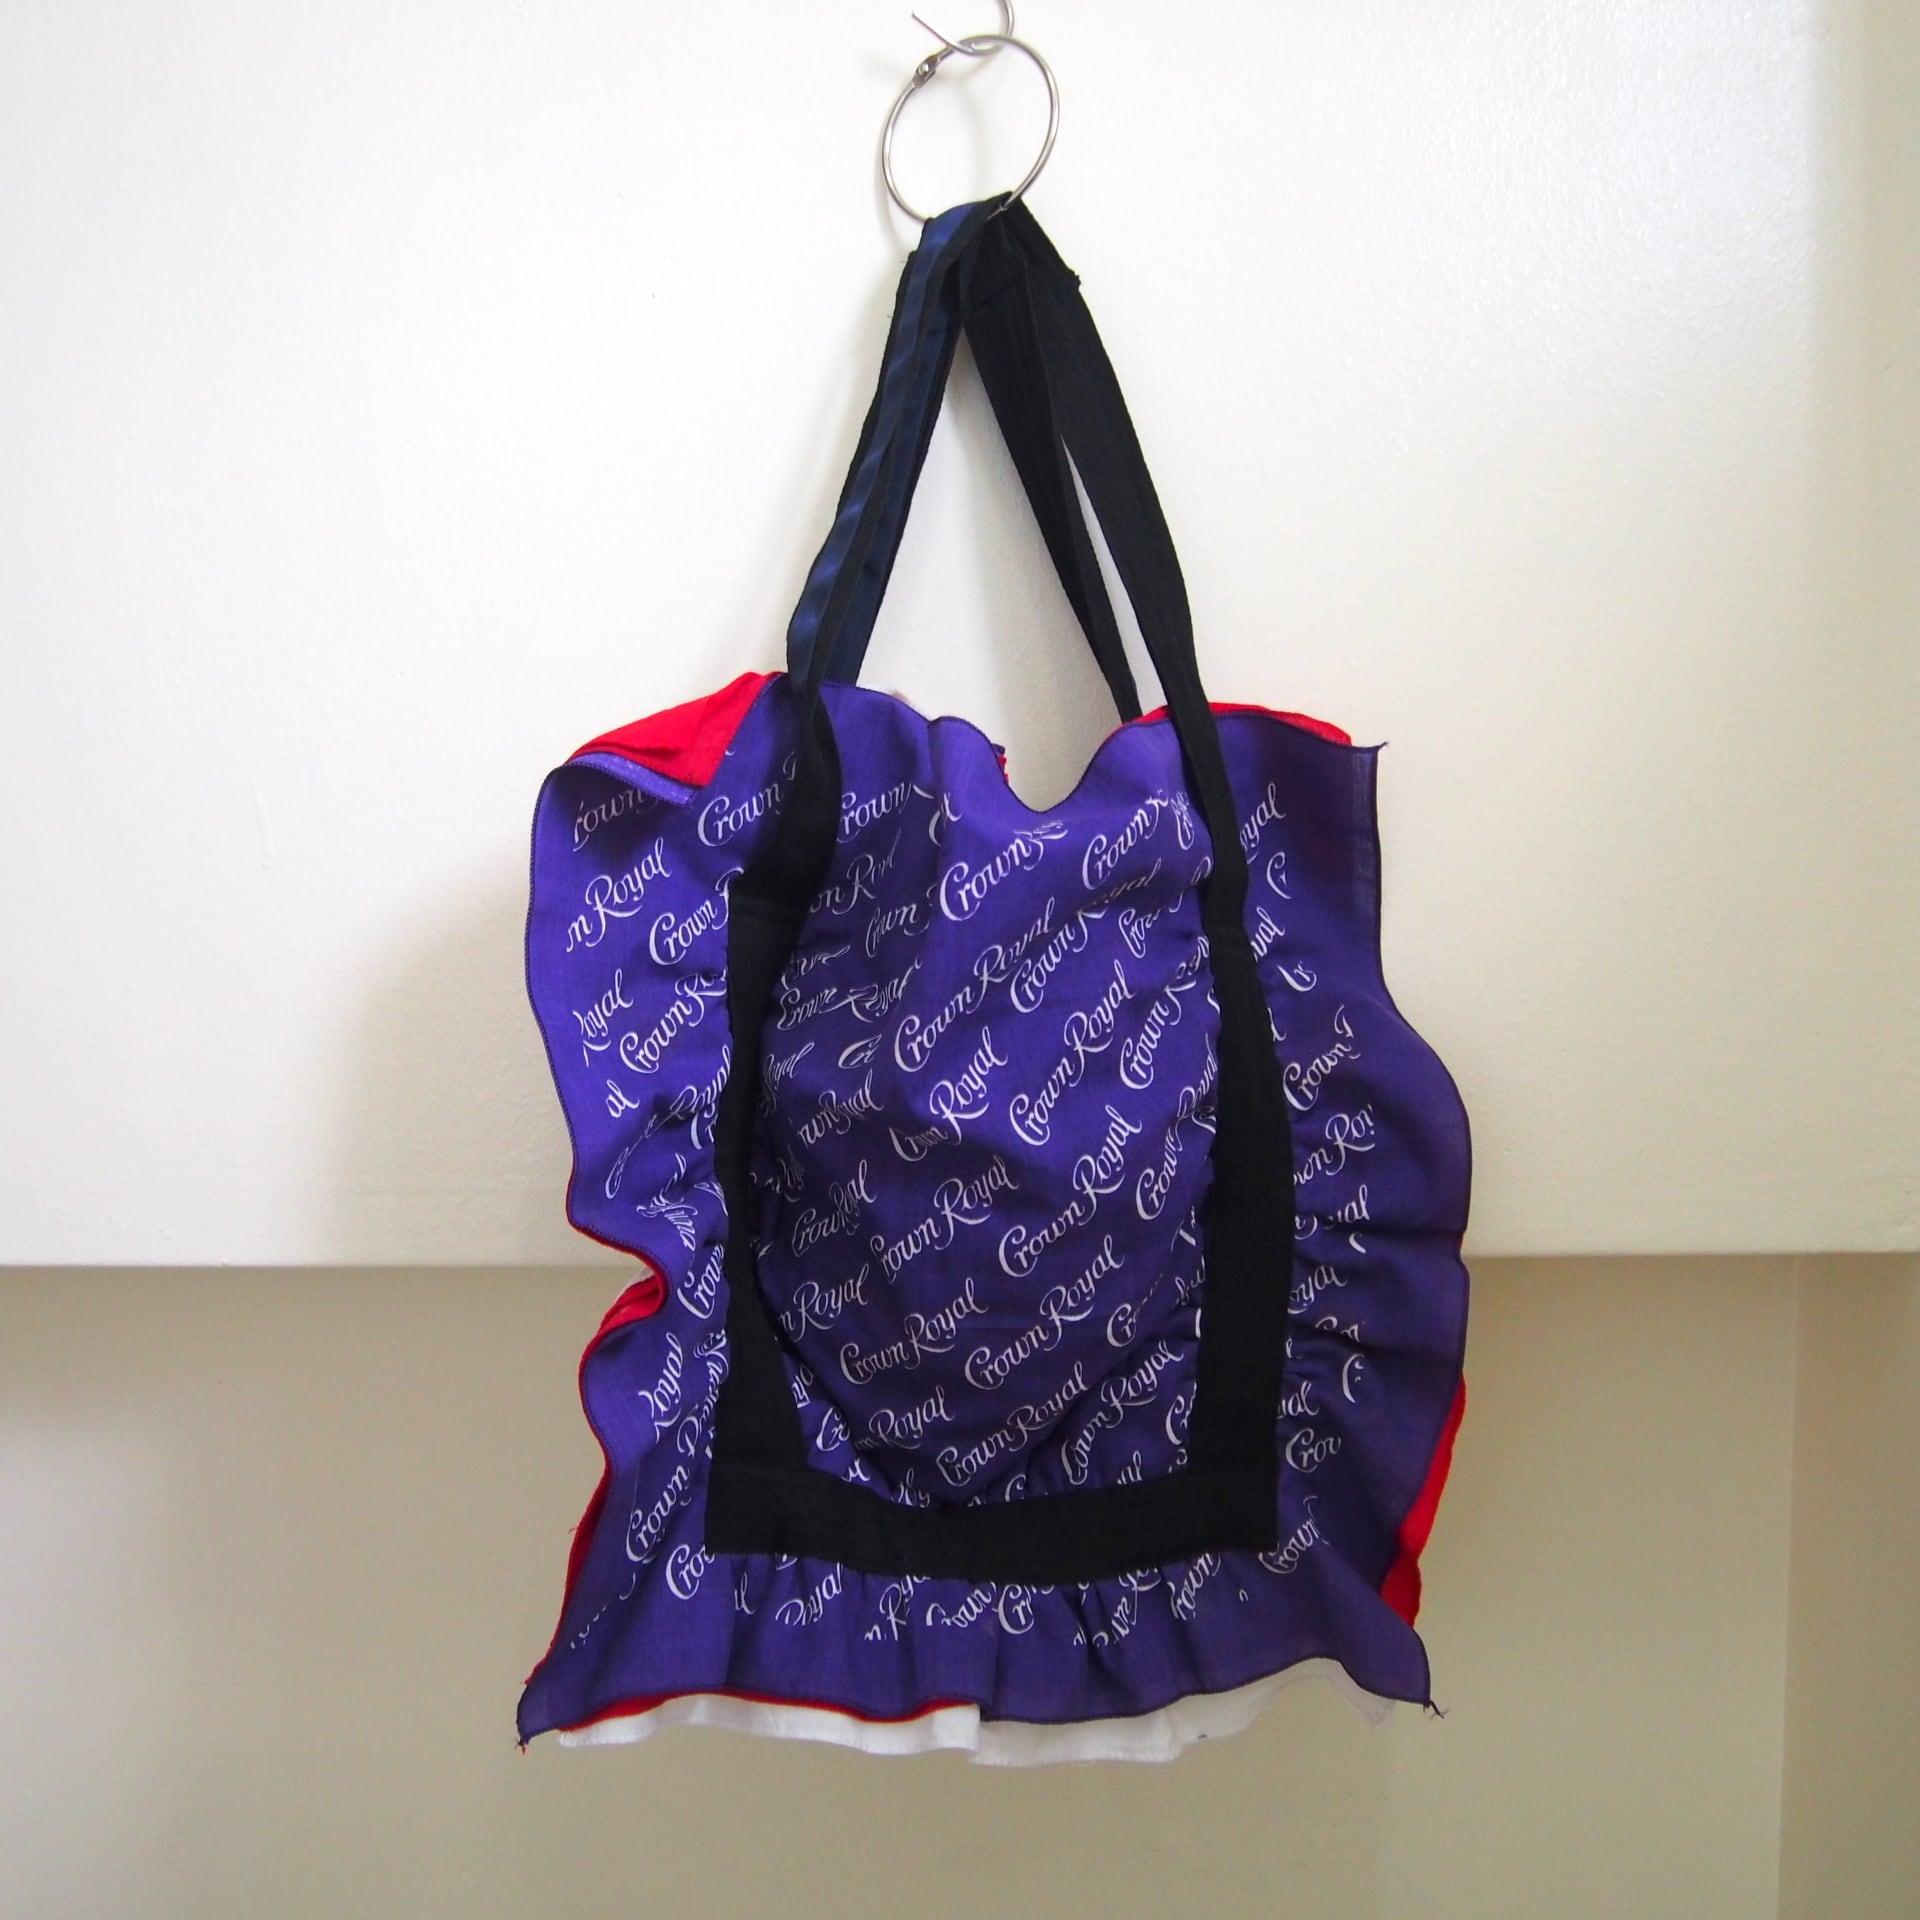 【RehersalL】bandanna bag(17)/【リハーズオール】バンダナバッグ(17)